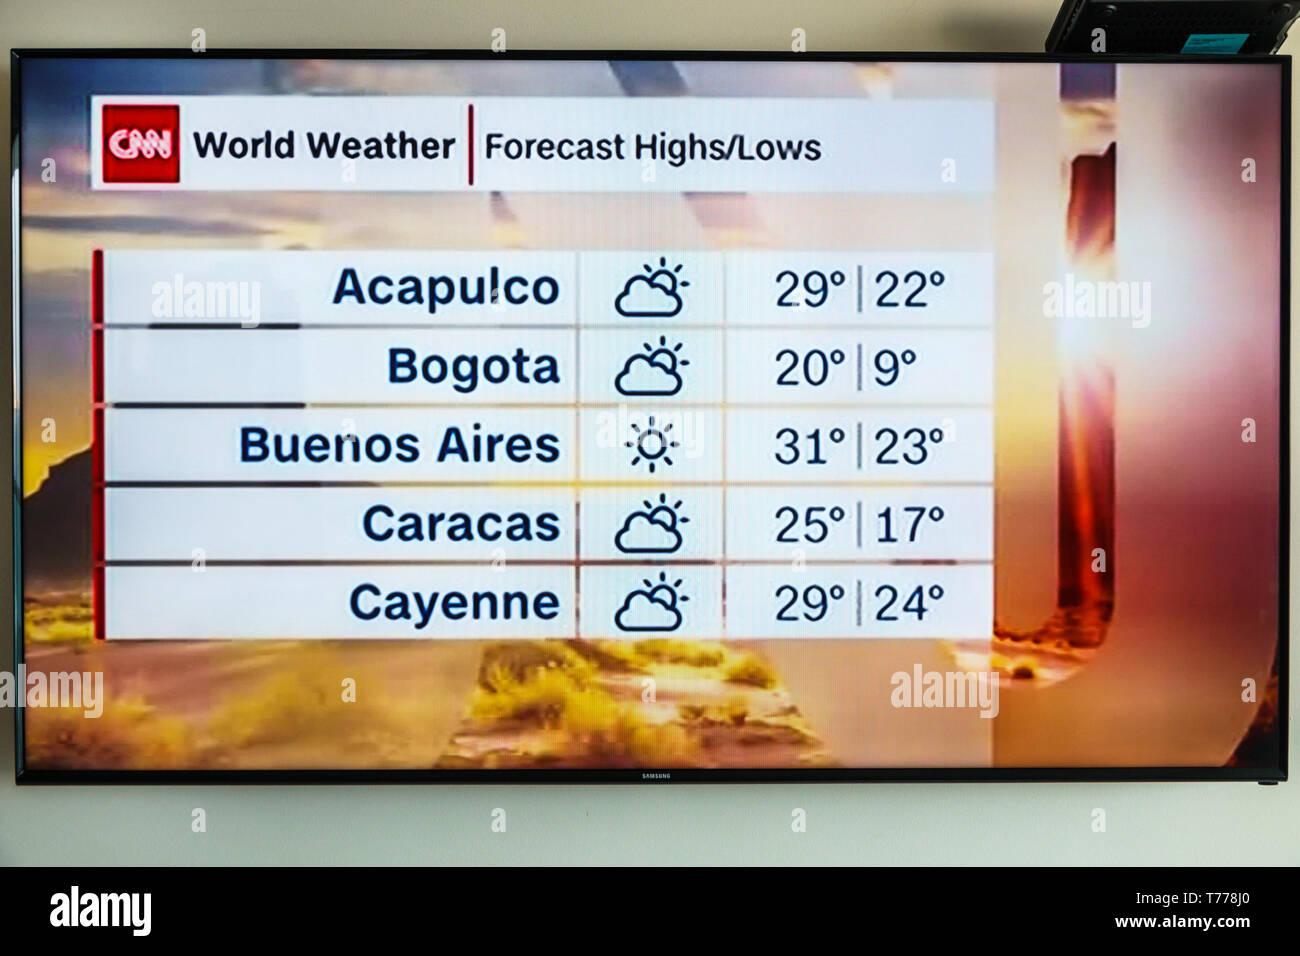 Colombia Cartagena Tv Television Monitor Screen Flat Screen Cnn World Weather Forecast Centigrade Latin America Cities Sightseeing Visitors Trav Stock Photo Alamy